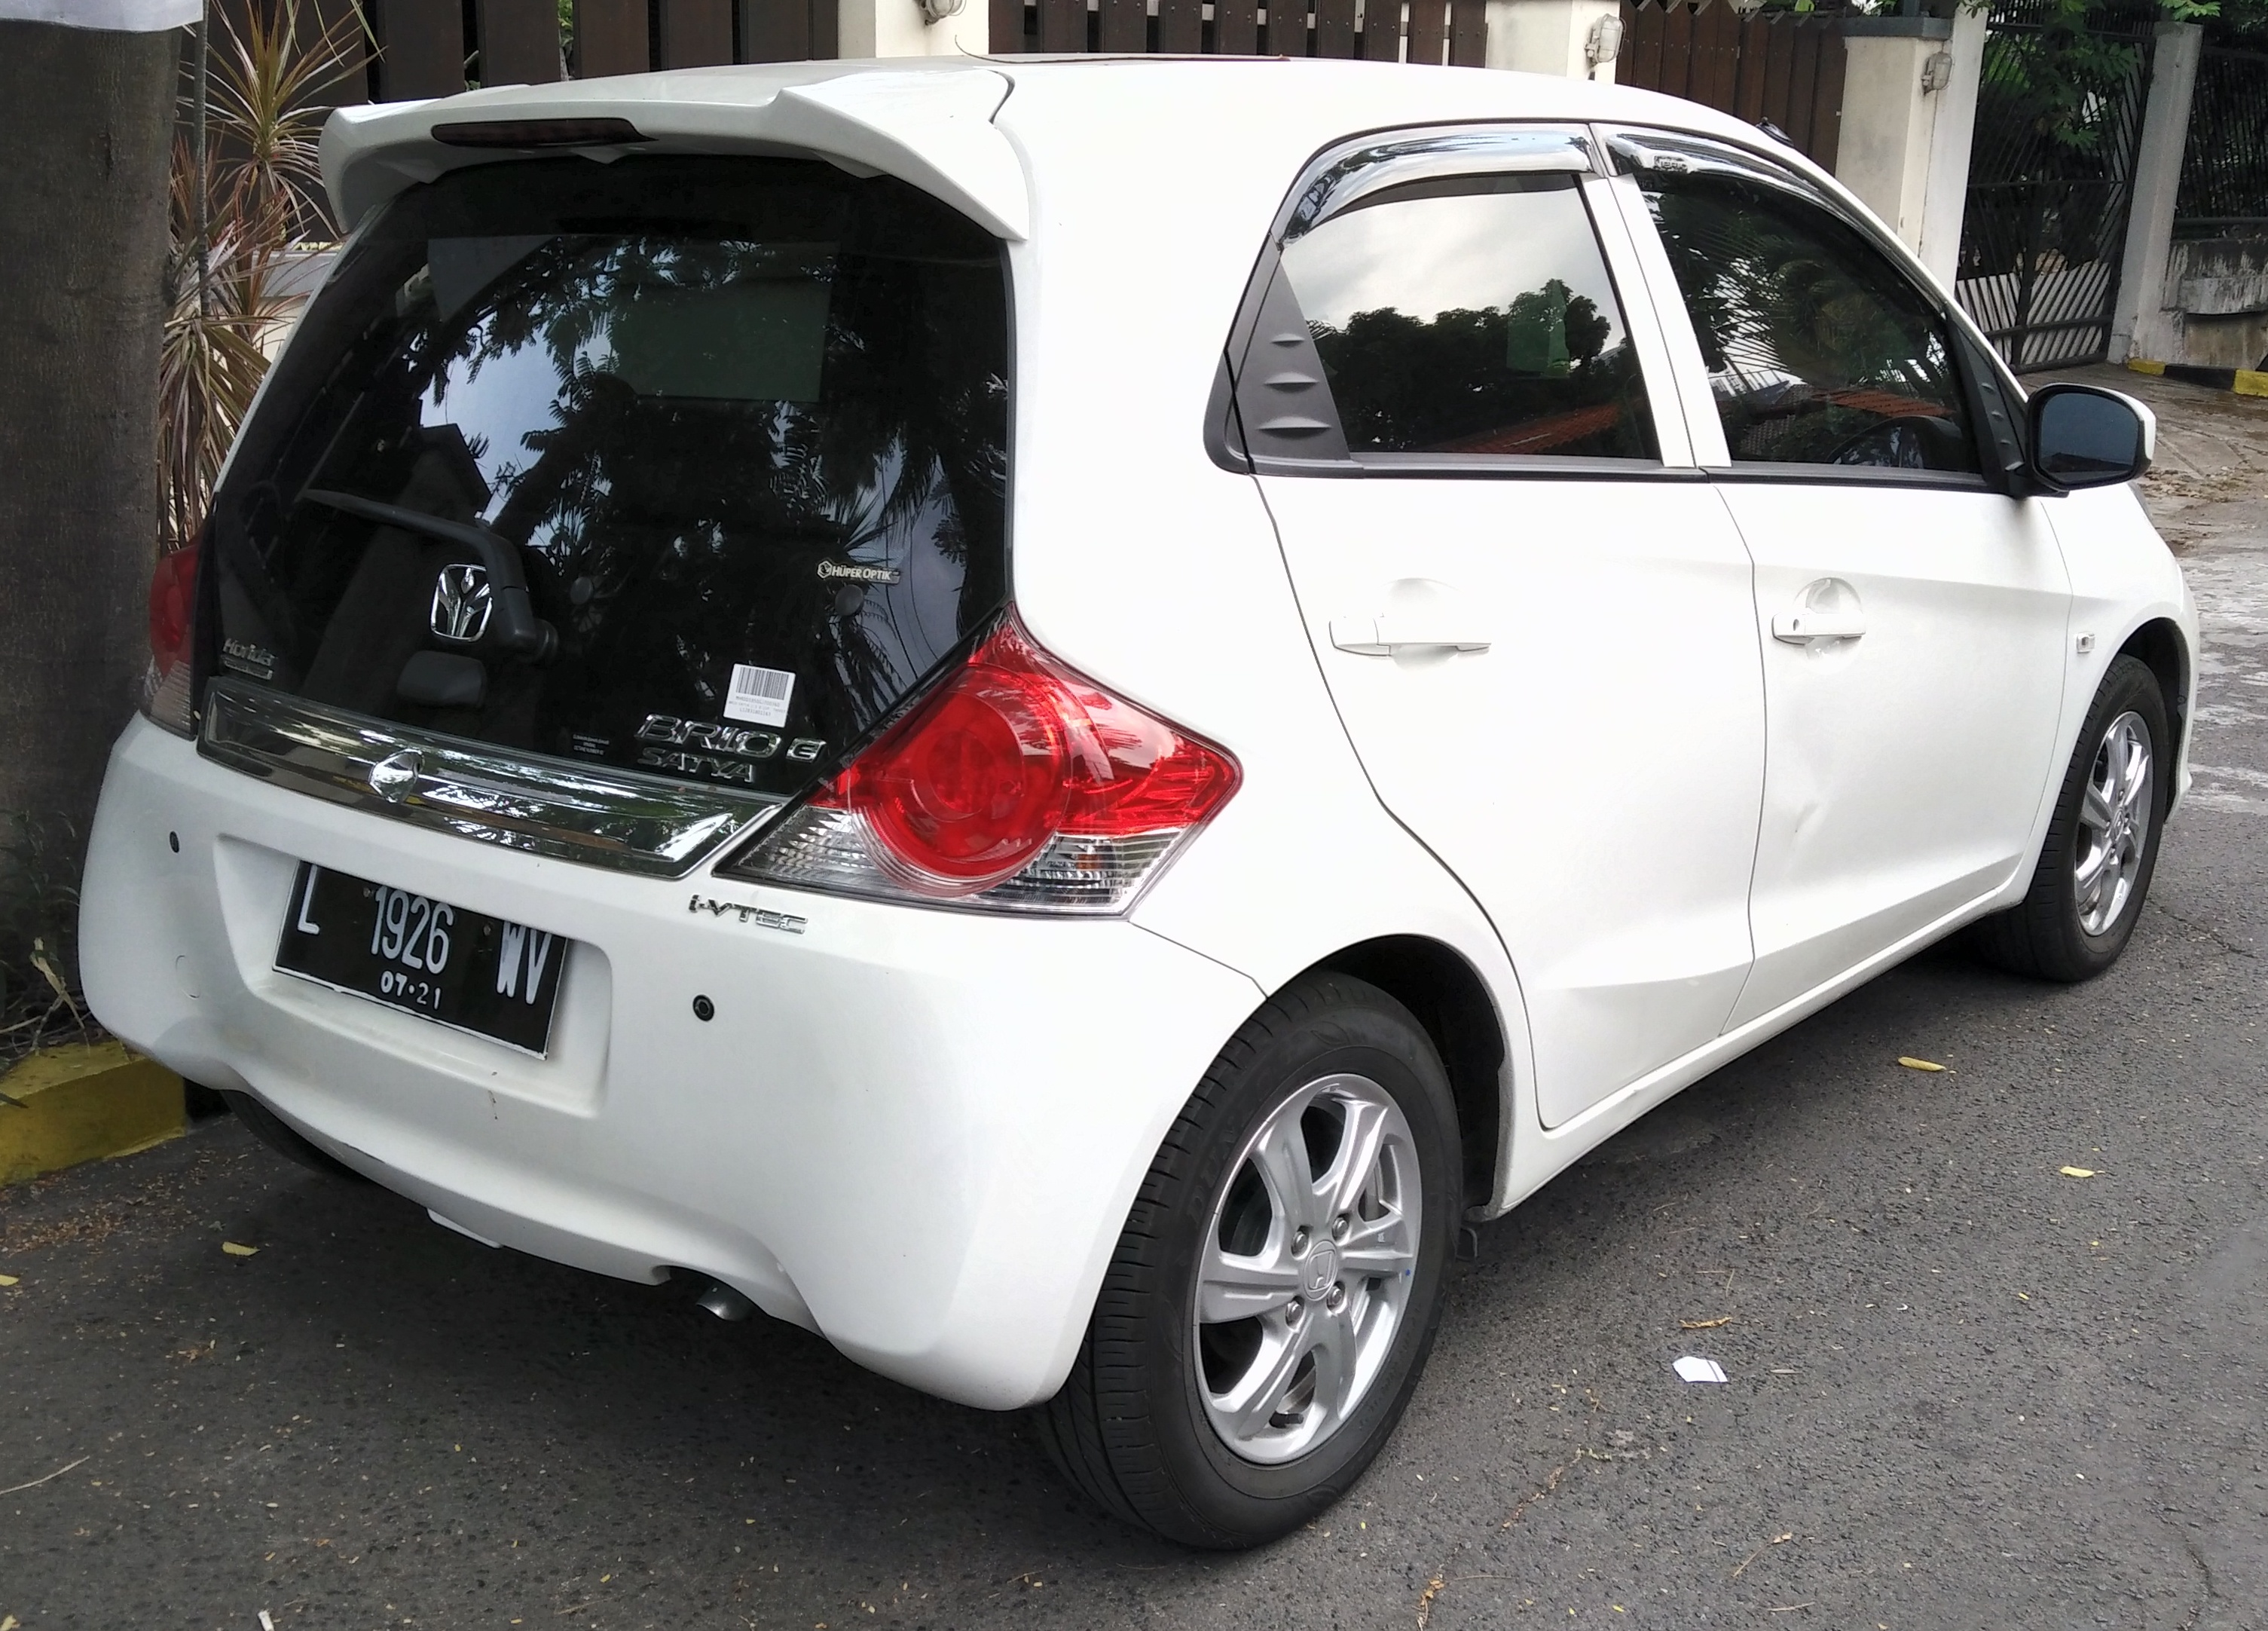 File:2016 Honda Brio Satya E (facelift) (rear), West Surabaya (cropped).jpg - Wikipedia